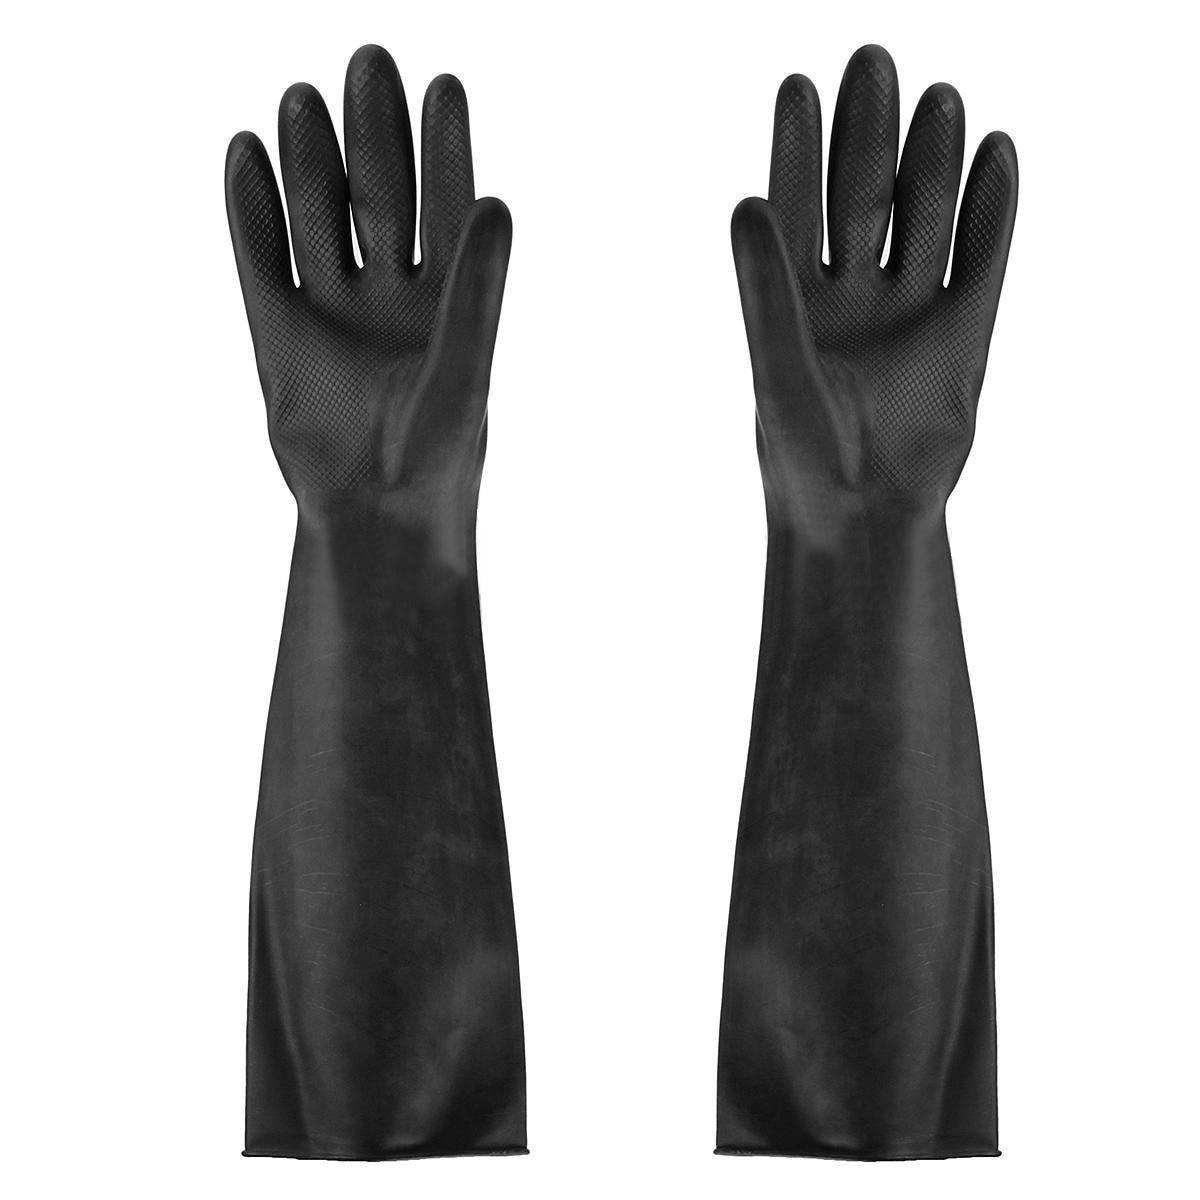 Black Long Protective Garden Industry Rubber Gloves Elastic Anti Acid Alkali Rubber Work Comfortable Chemical Gloves 60cm Mayitr все цены